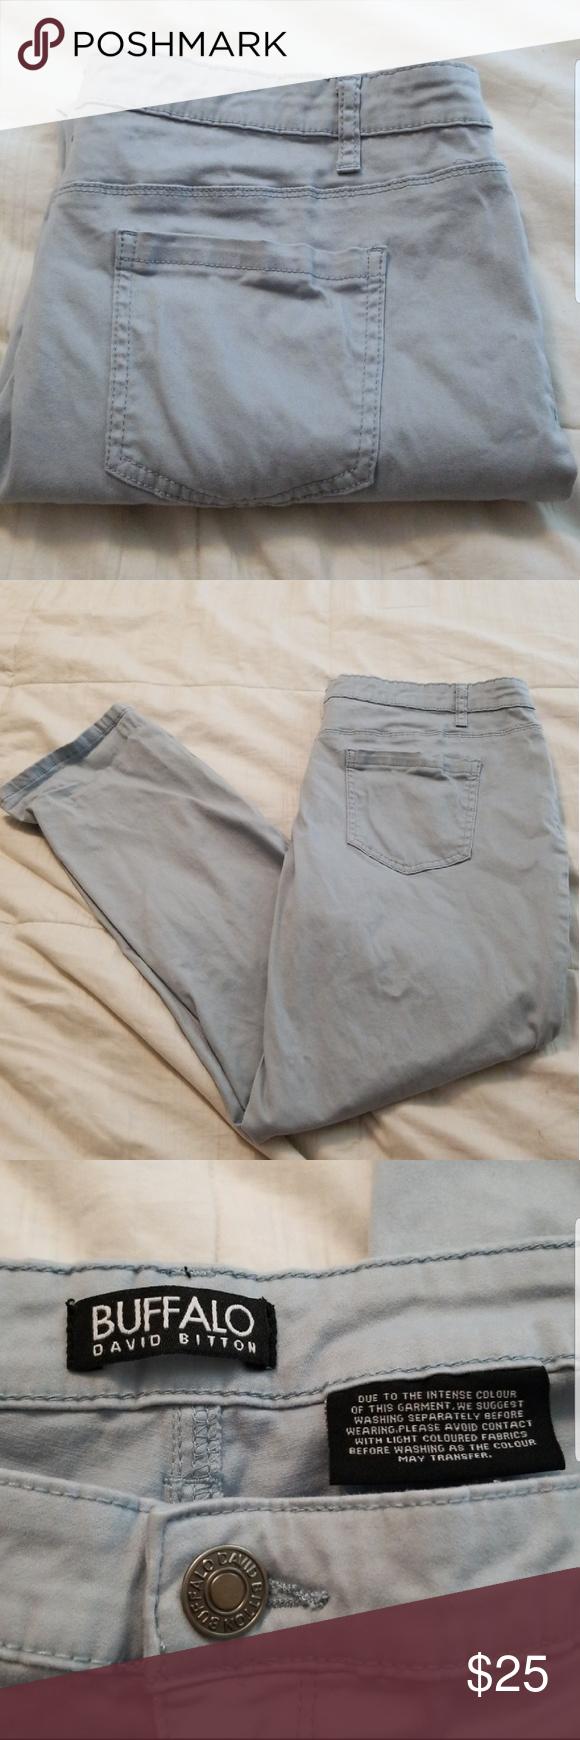 "Buffalo David Bitton Women/'s /""DAILY /"" Mid Rise Stretch Skinny Ankle Grazer Pants"